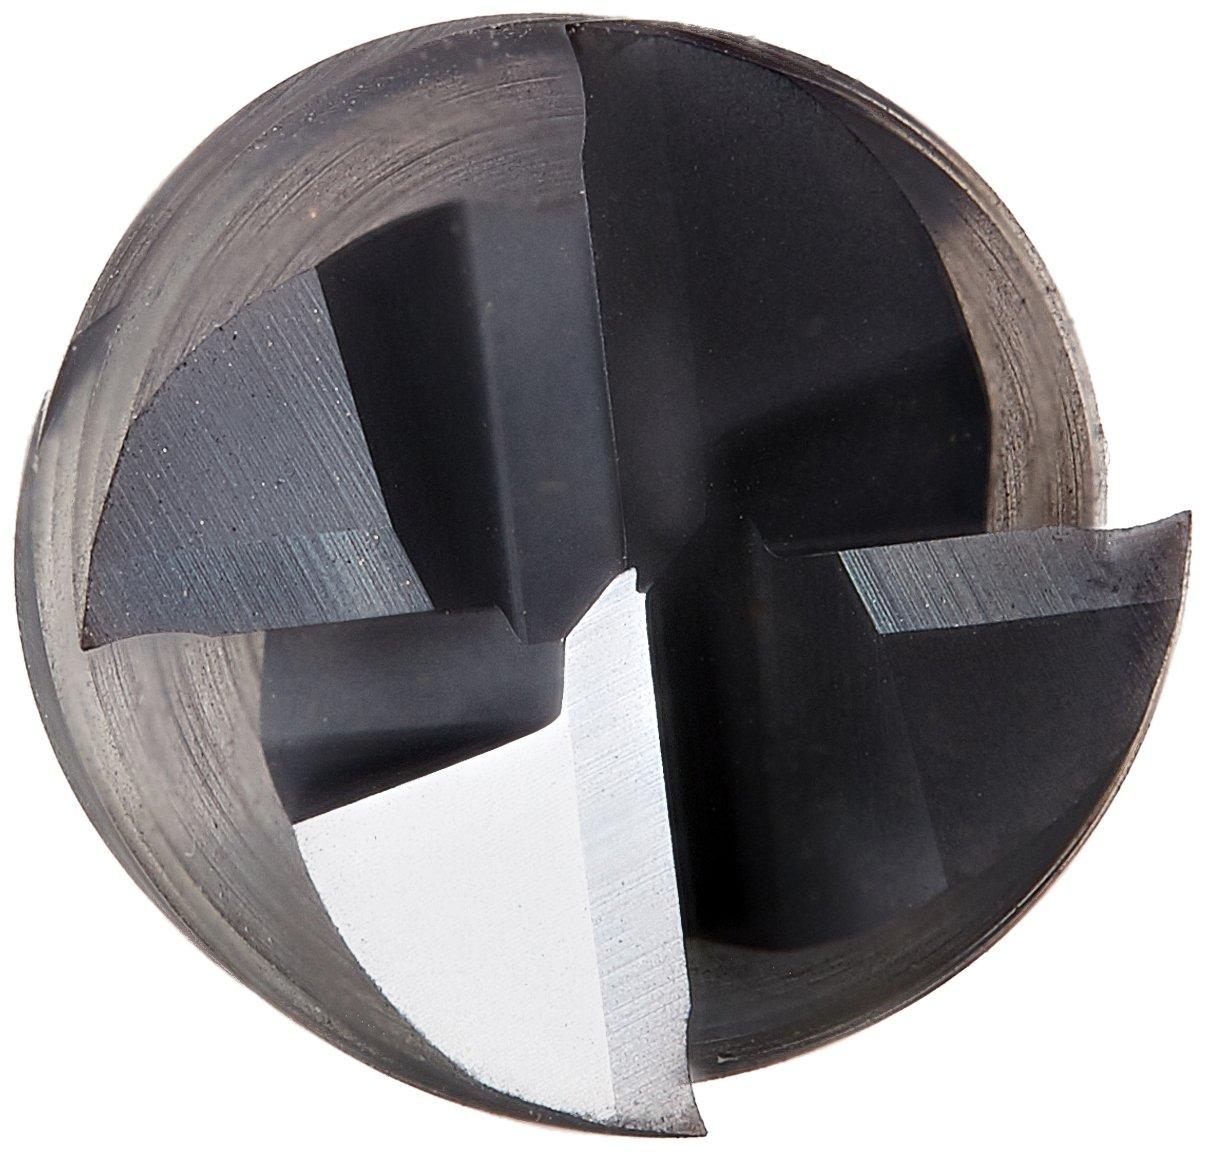 Kodiak Cutting Tools KCT131569 USA Made Premium Solid Carbide End Mill 4 Flute 5//16 Diameter AlTiN Coated